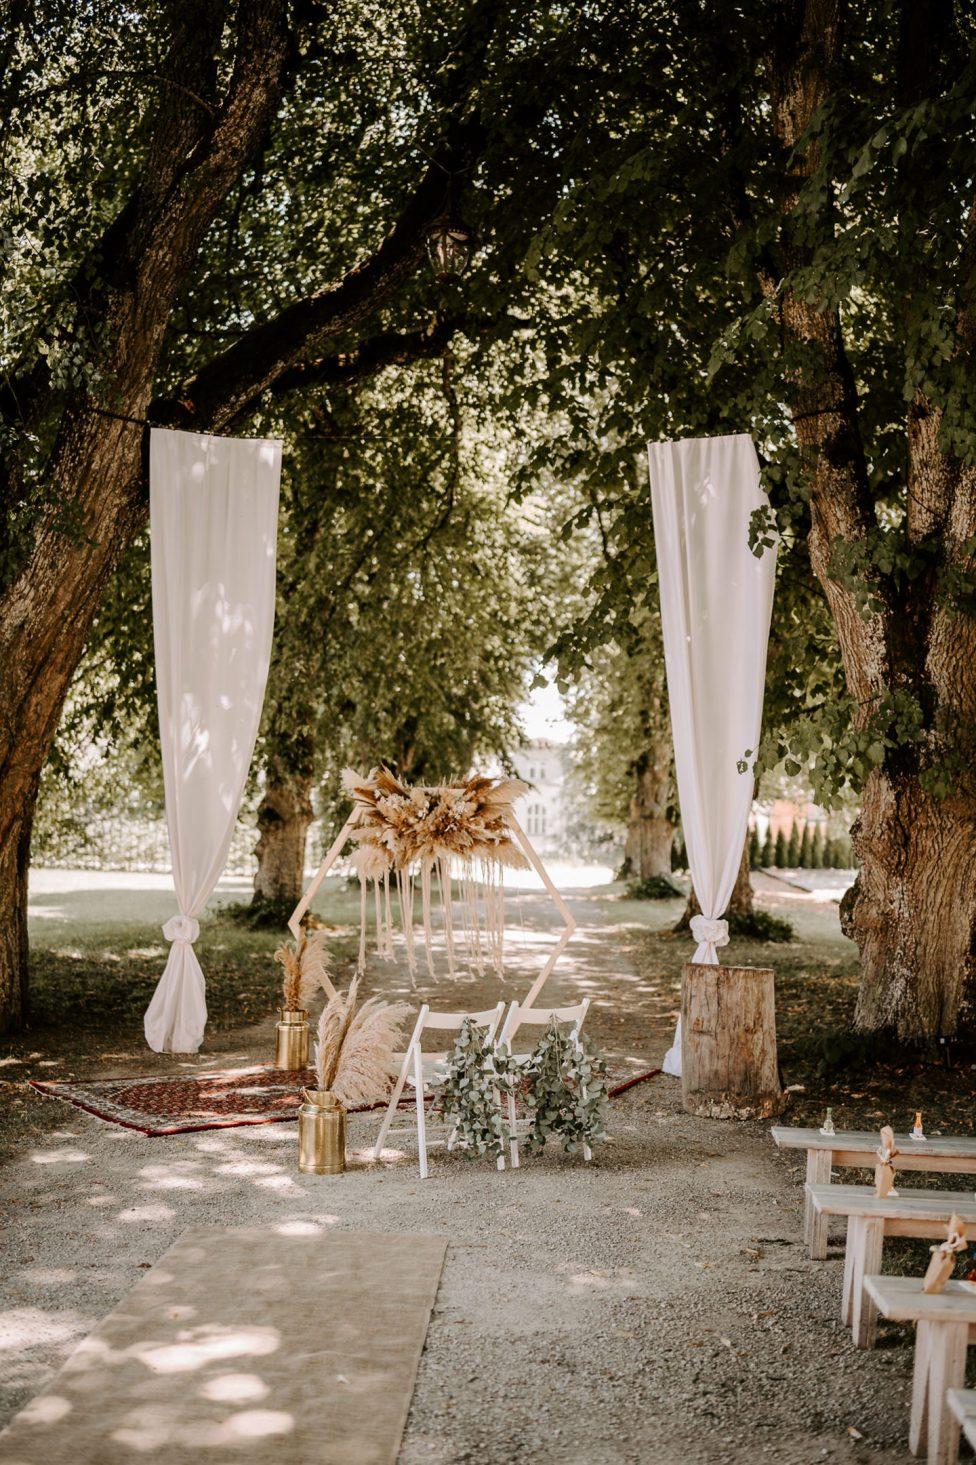 Magical Homes: Bohemian Hochzeit im Festival-Style